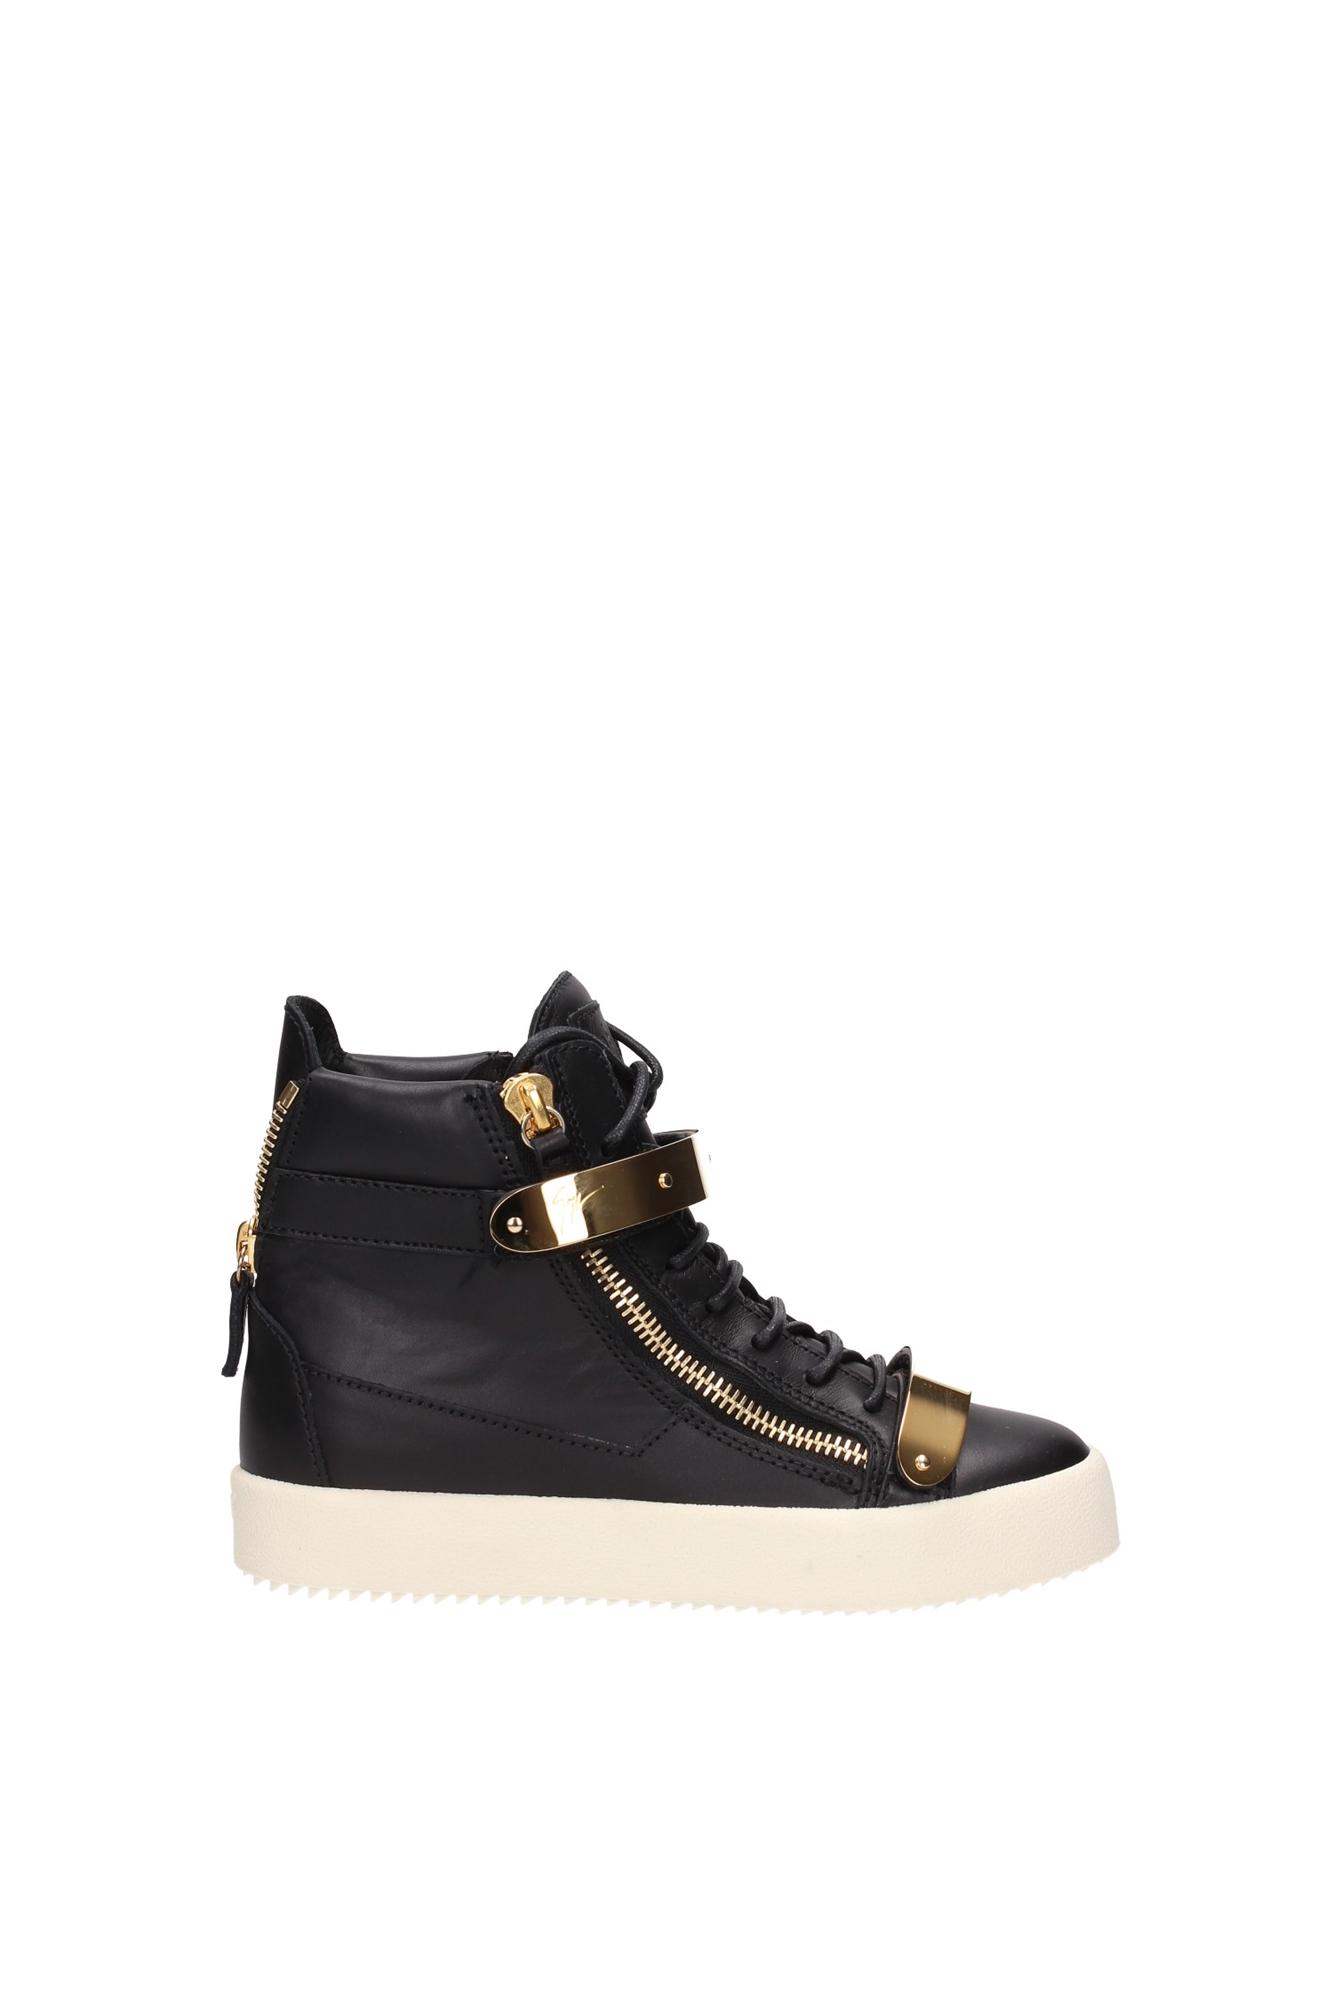 sneakers giuseppe zanotti damen leder schwarz rs5029maynero. Black Bedroom Furniture Sets. Home Design Ideas